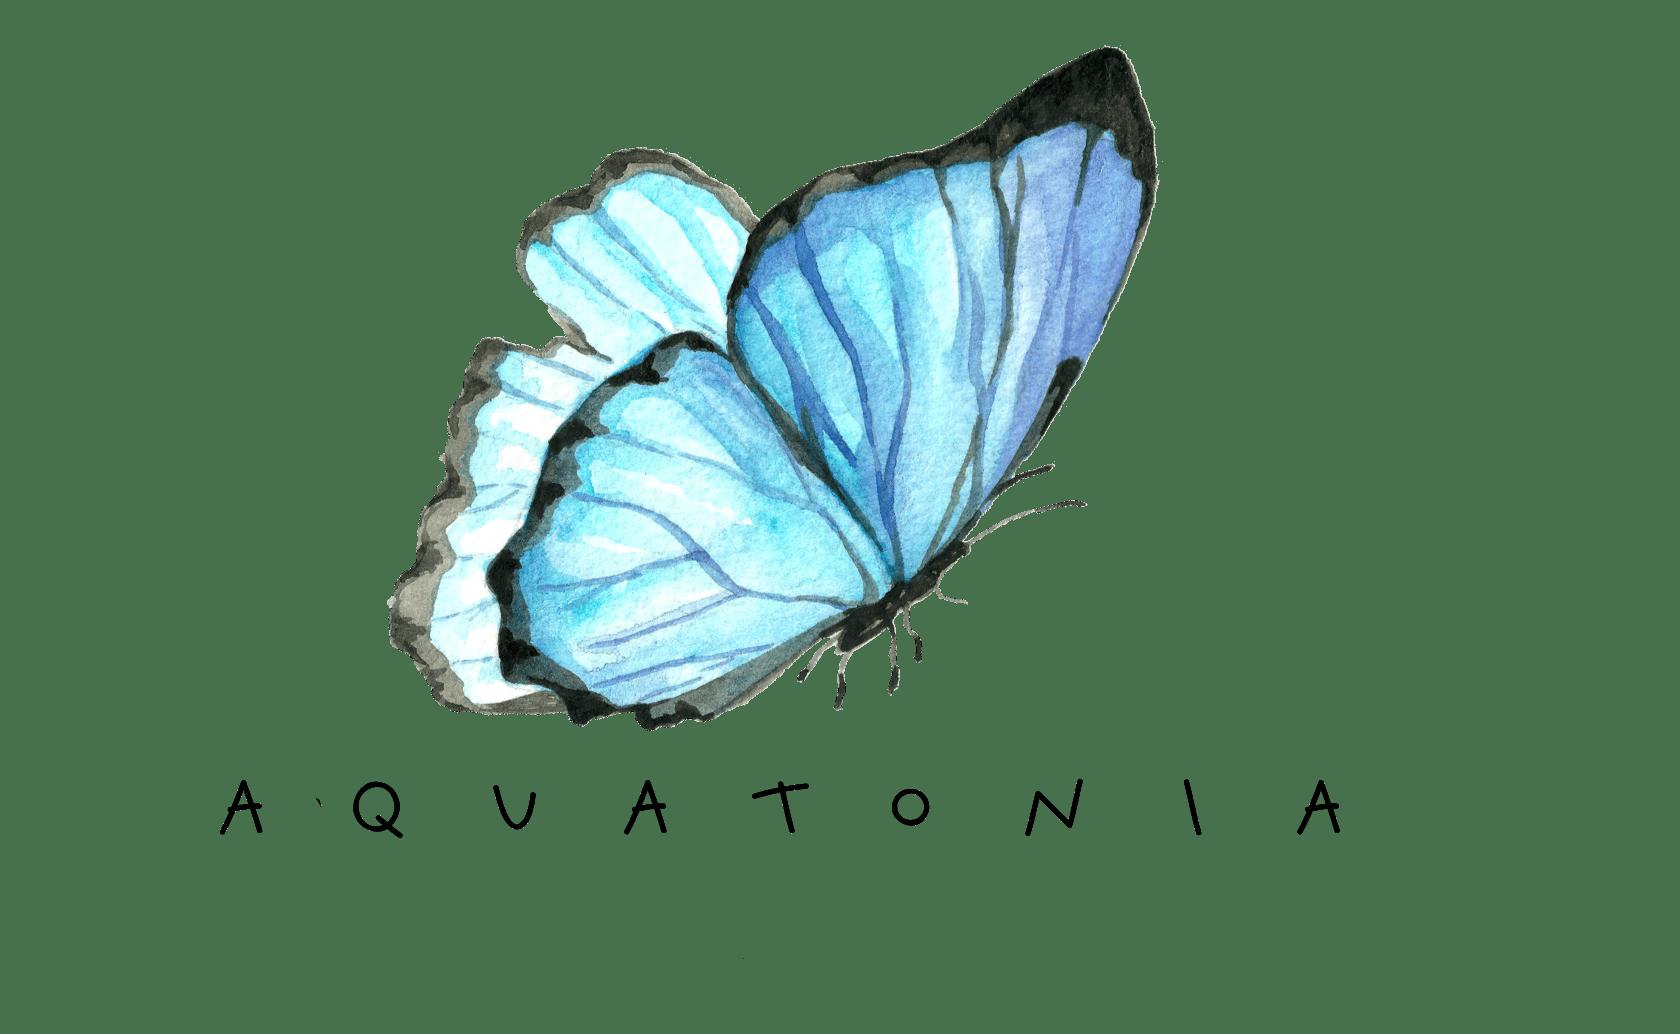 AQUATONIA